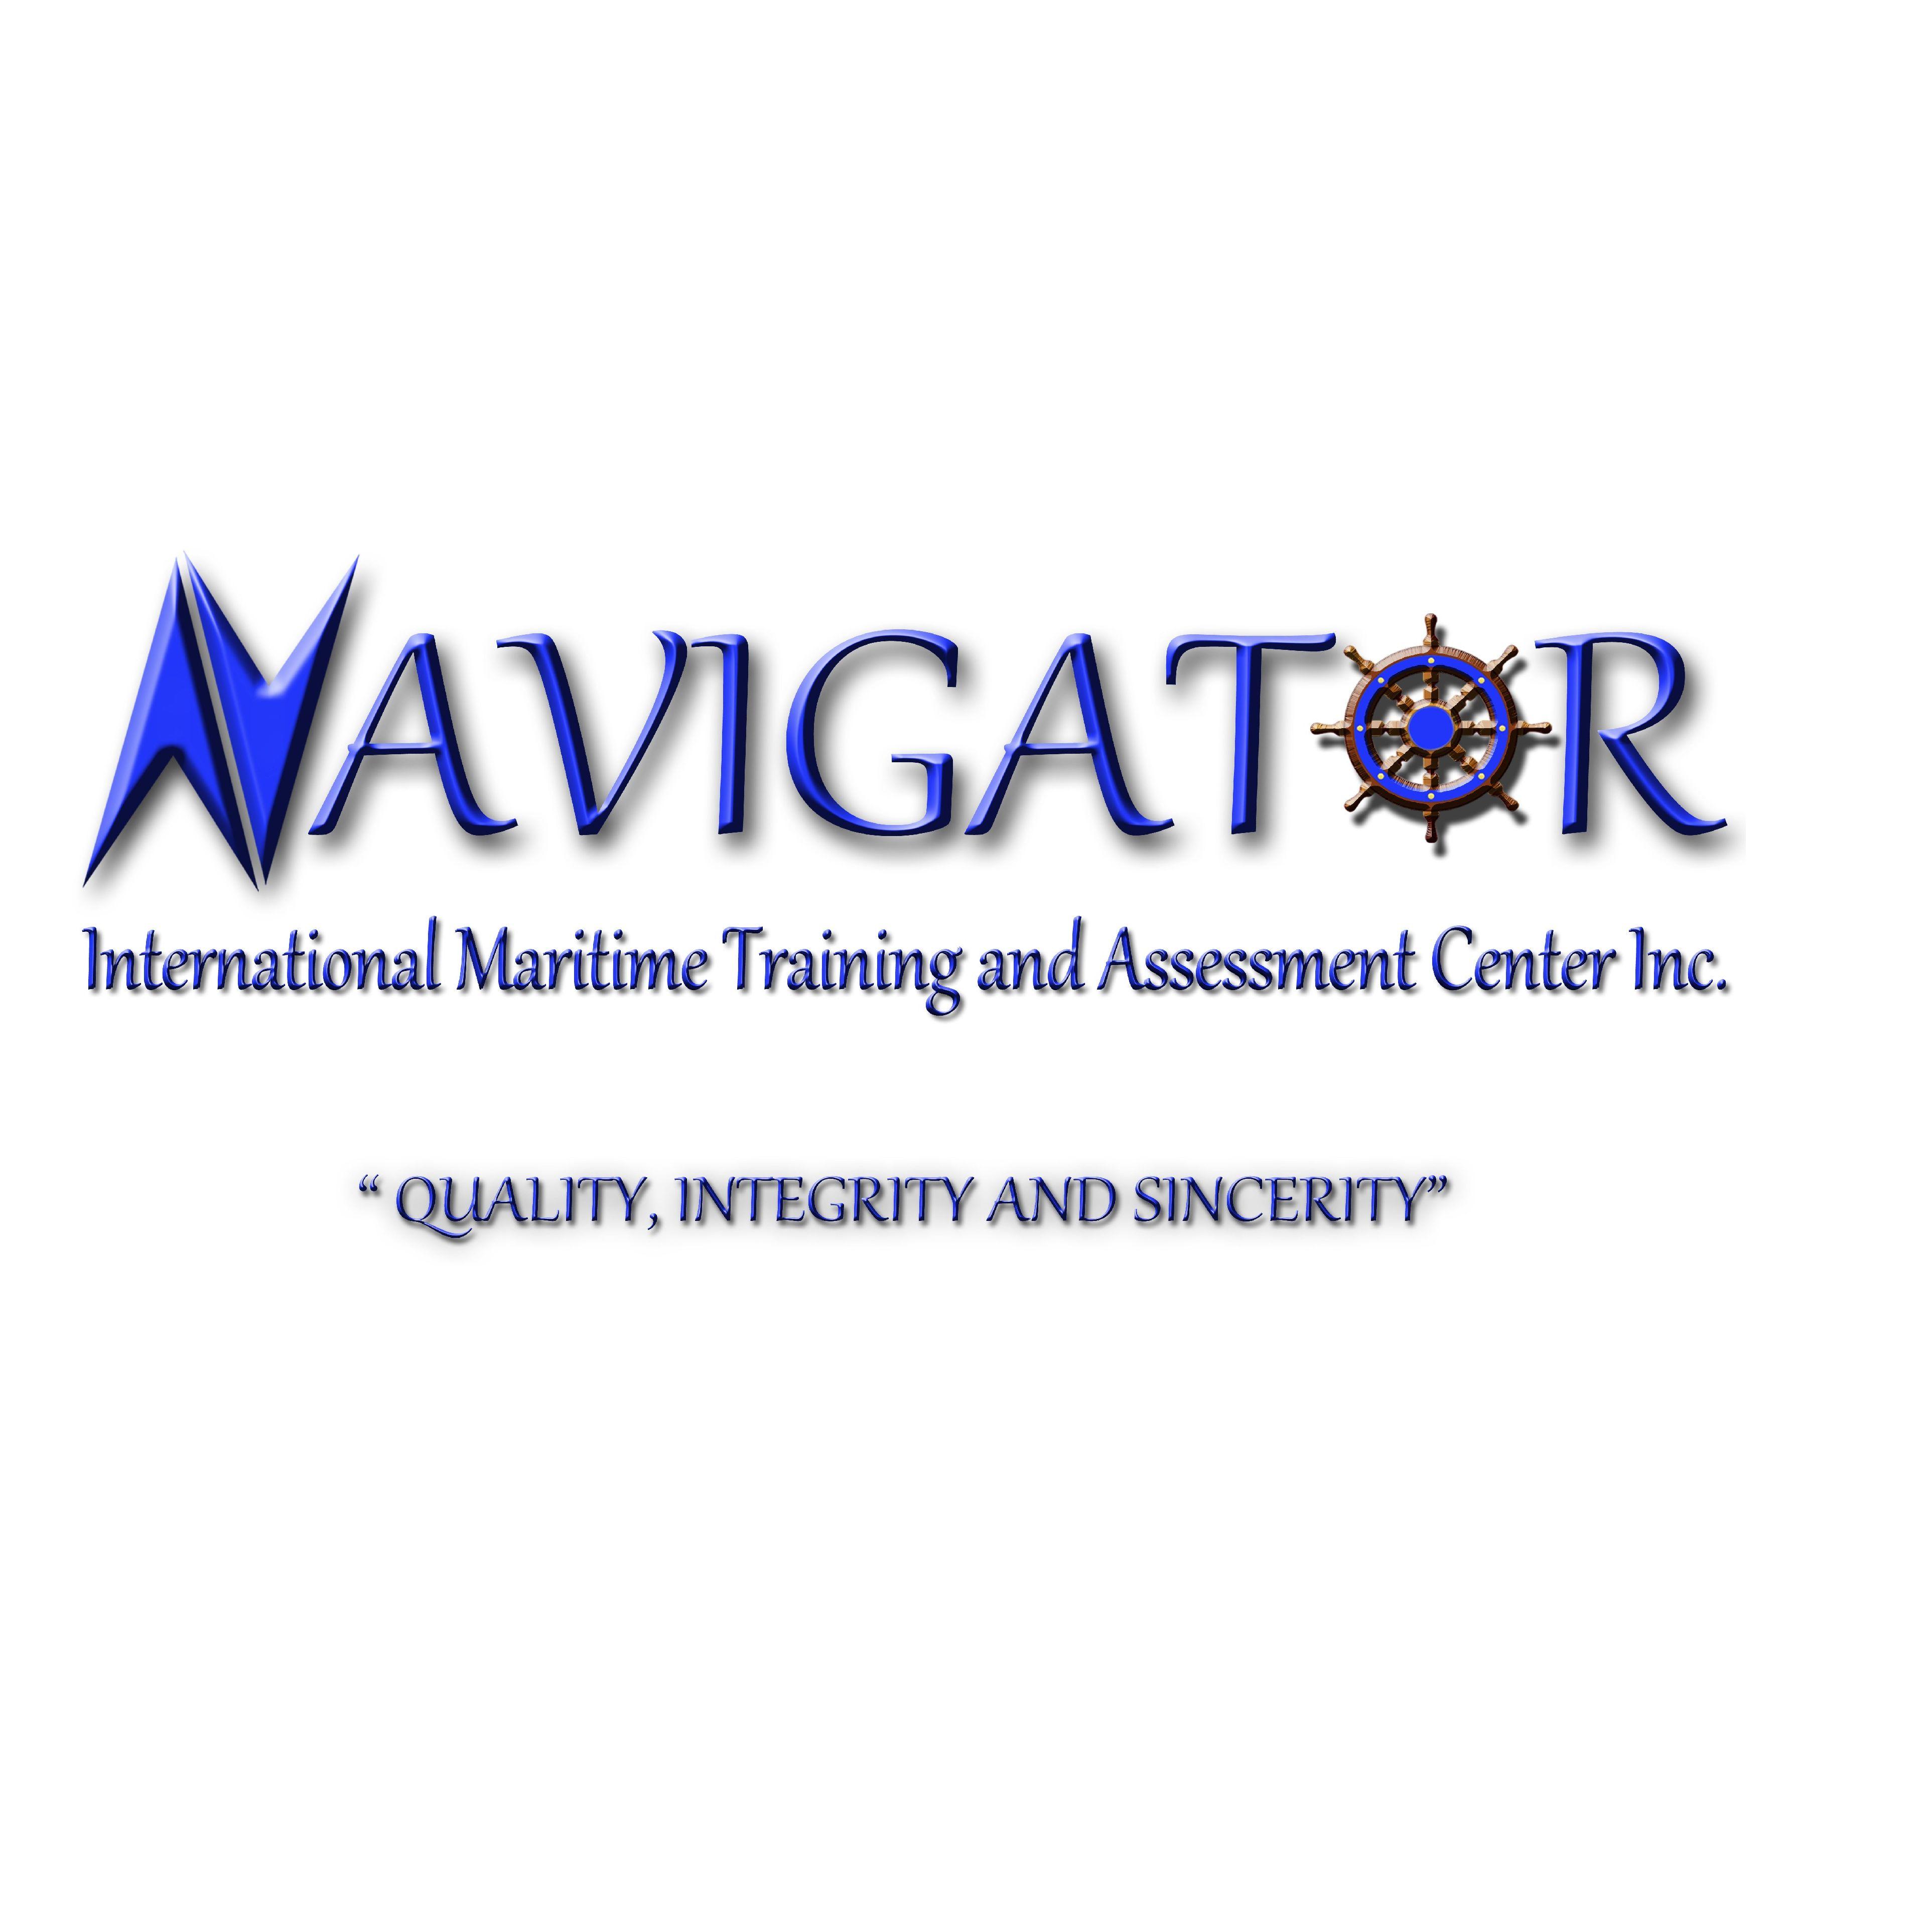 Navigator International Maritime Training And Assessment Center Inc